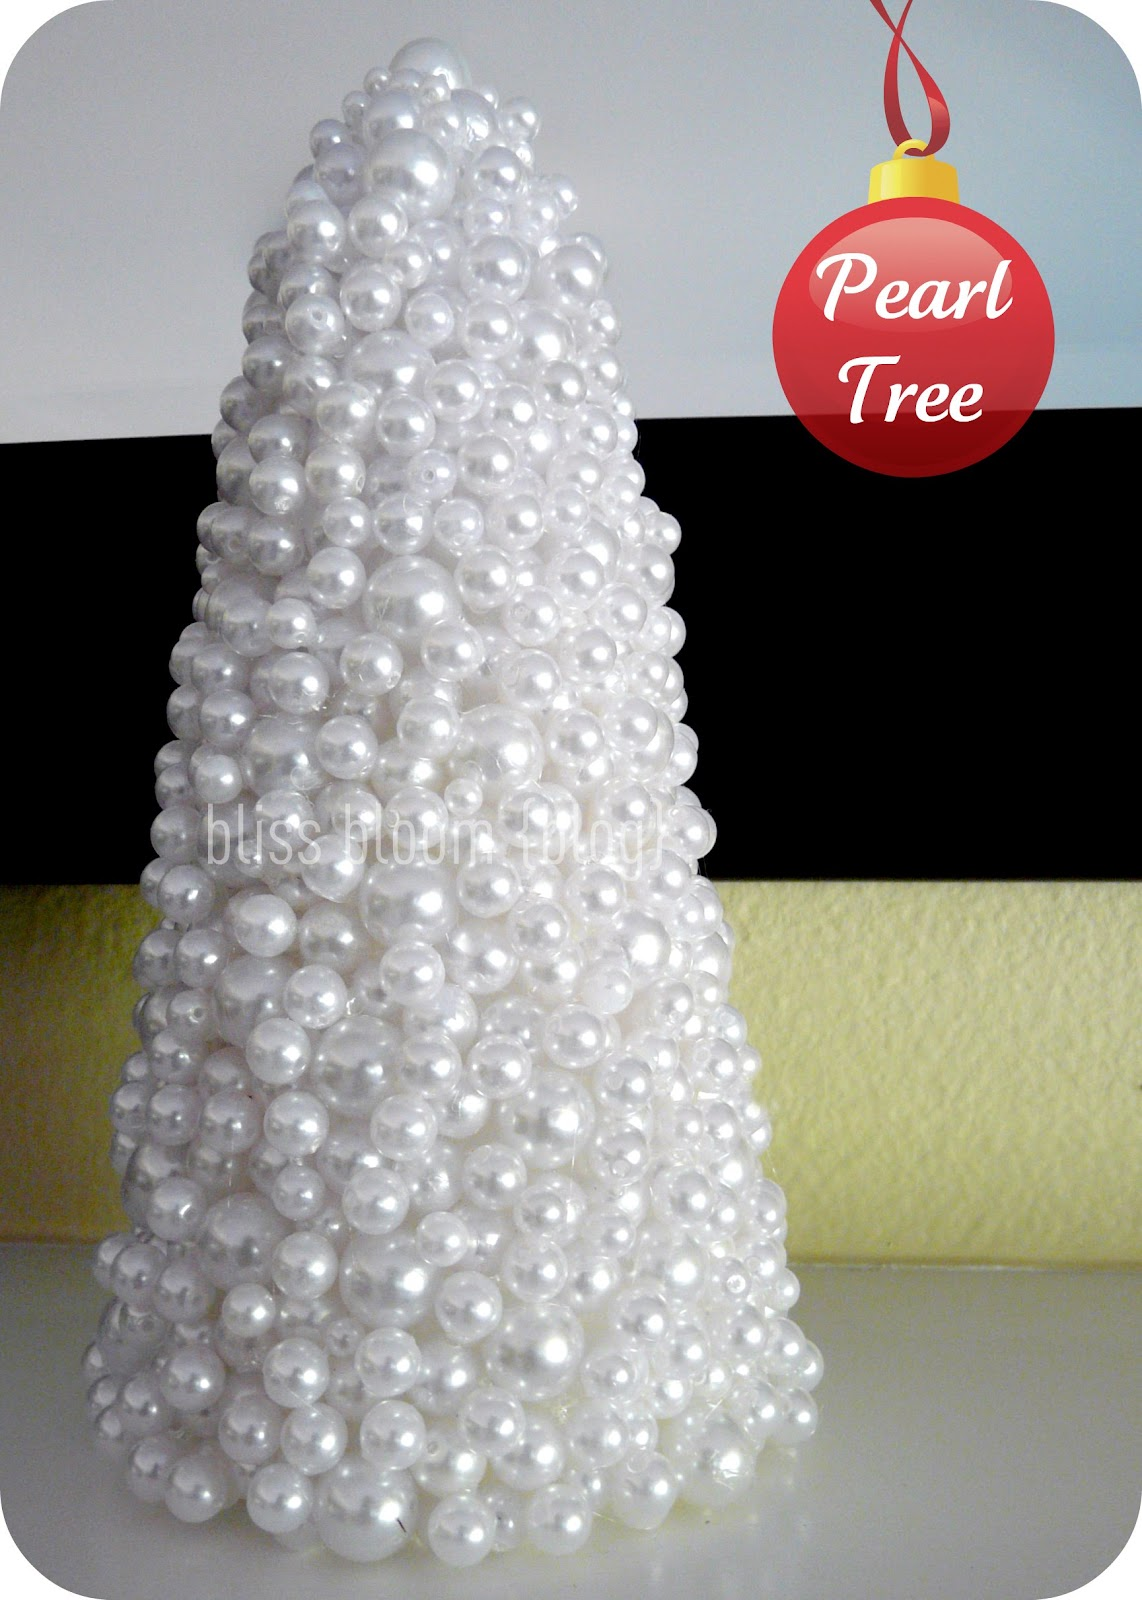 oh christmas tree series pearl tree - The Christmas Pearl